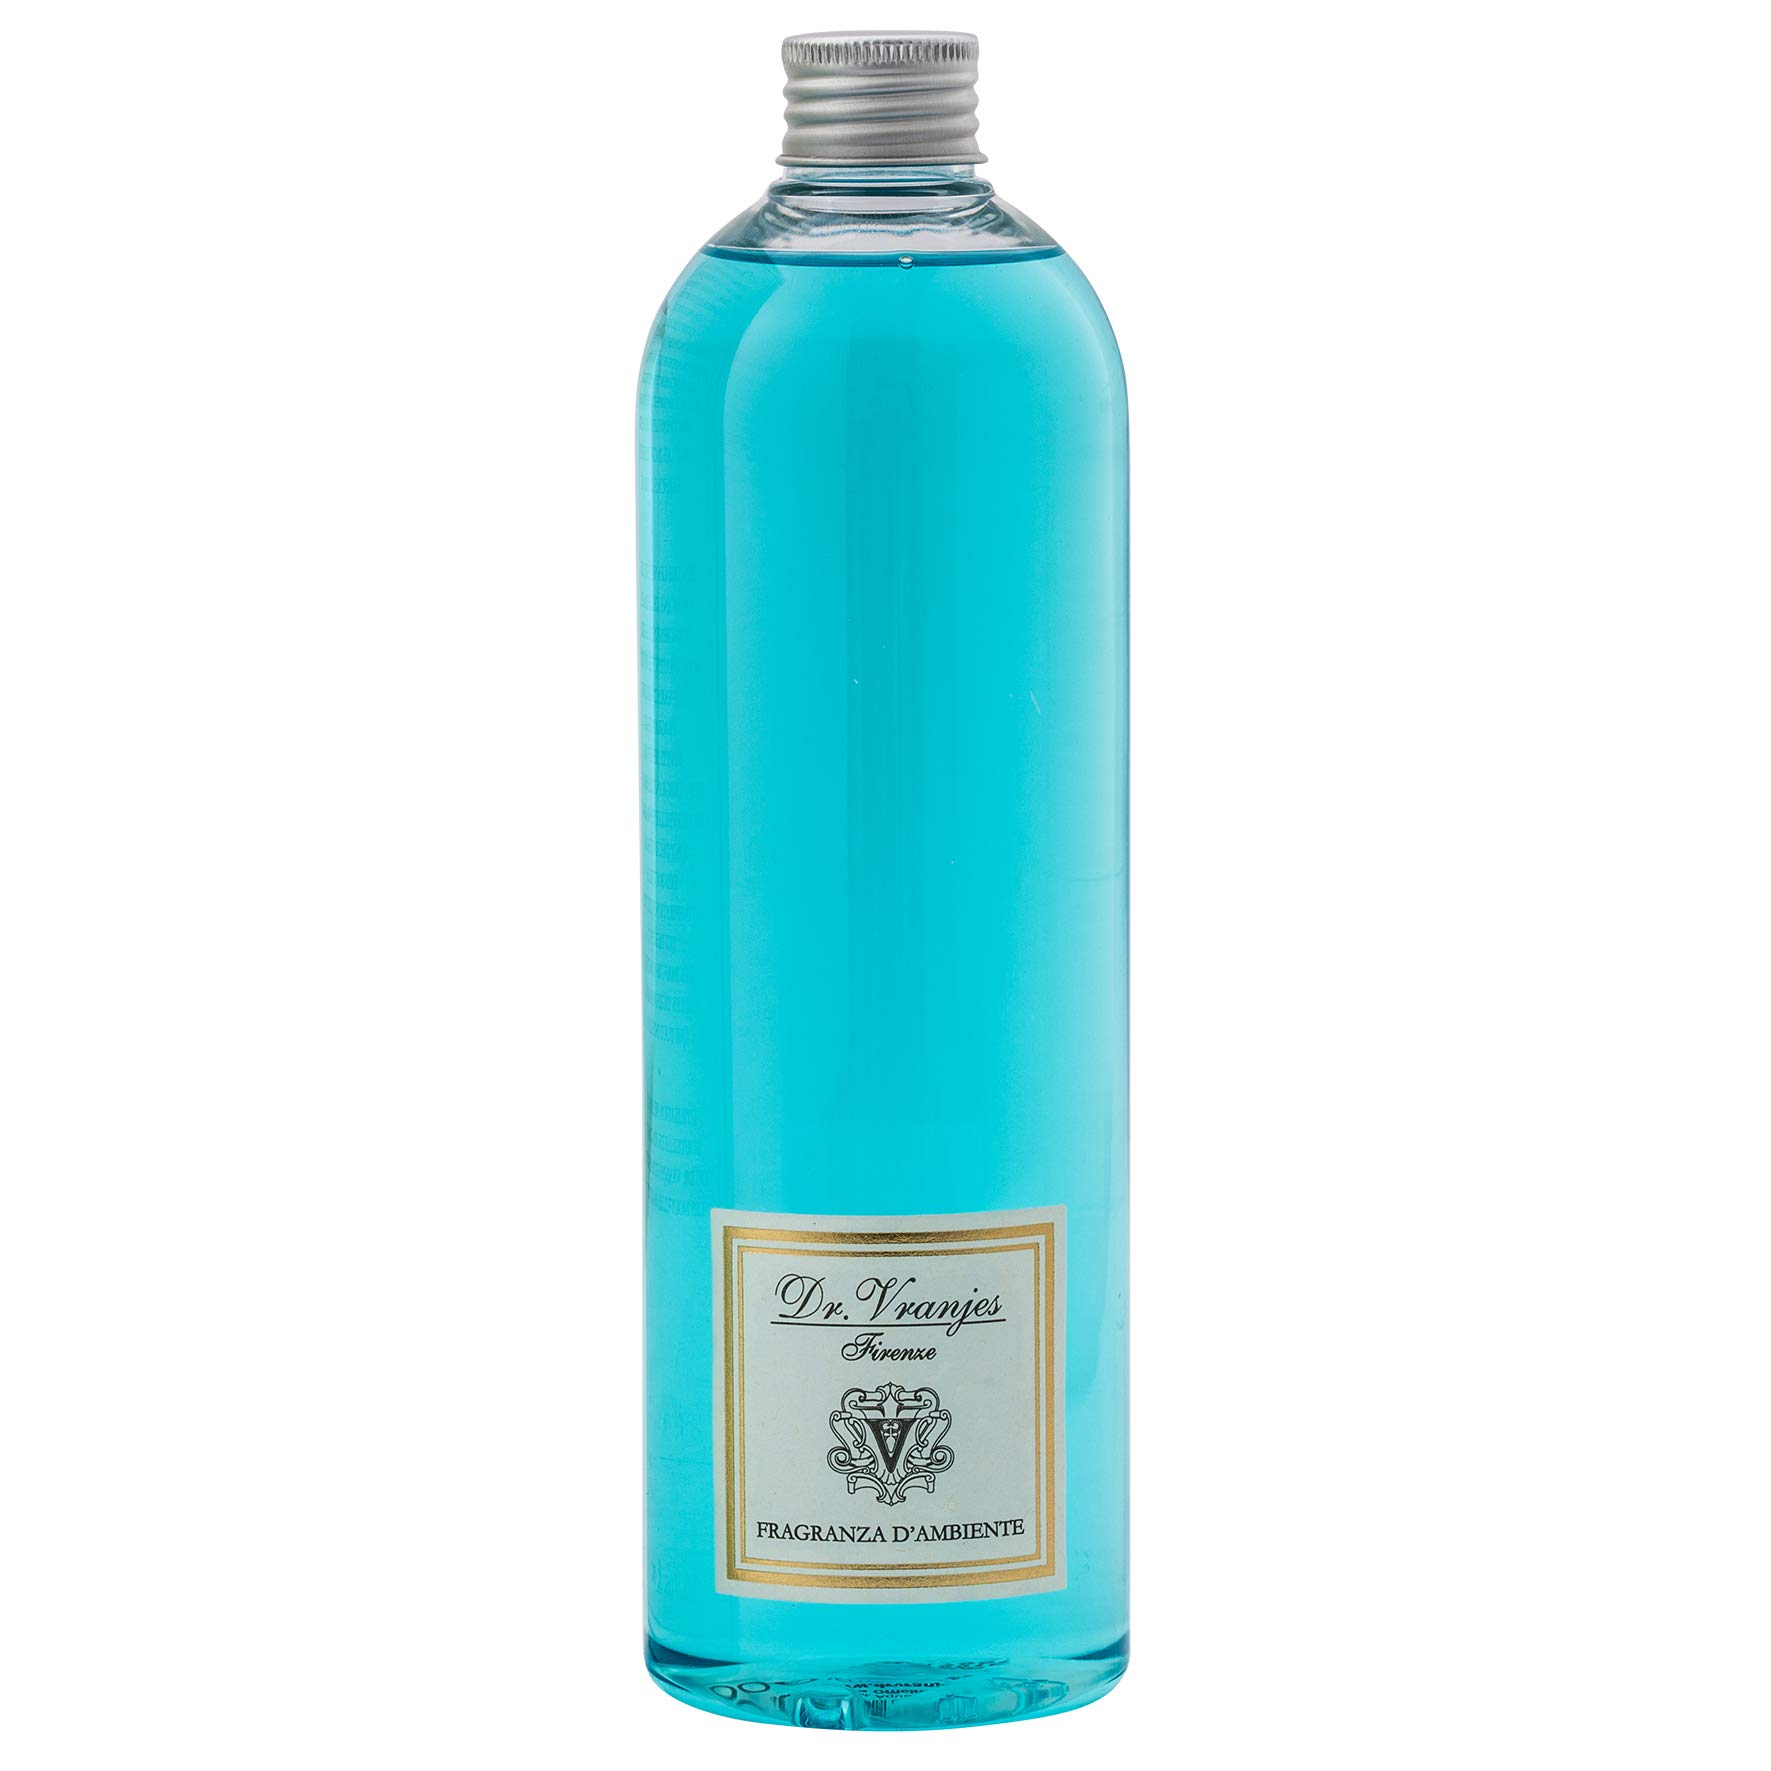 Dr. Vranjes Crystal Room Diffuser Refill 500 ml - Acqua